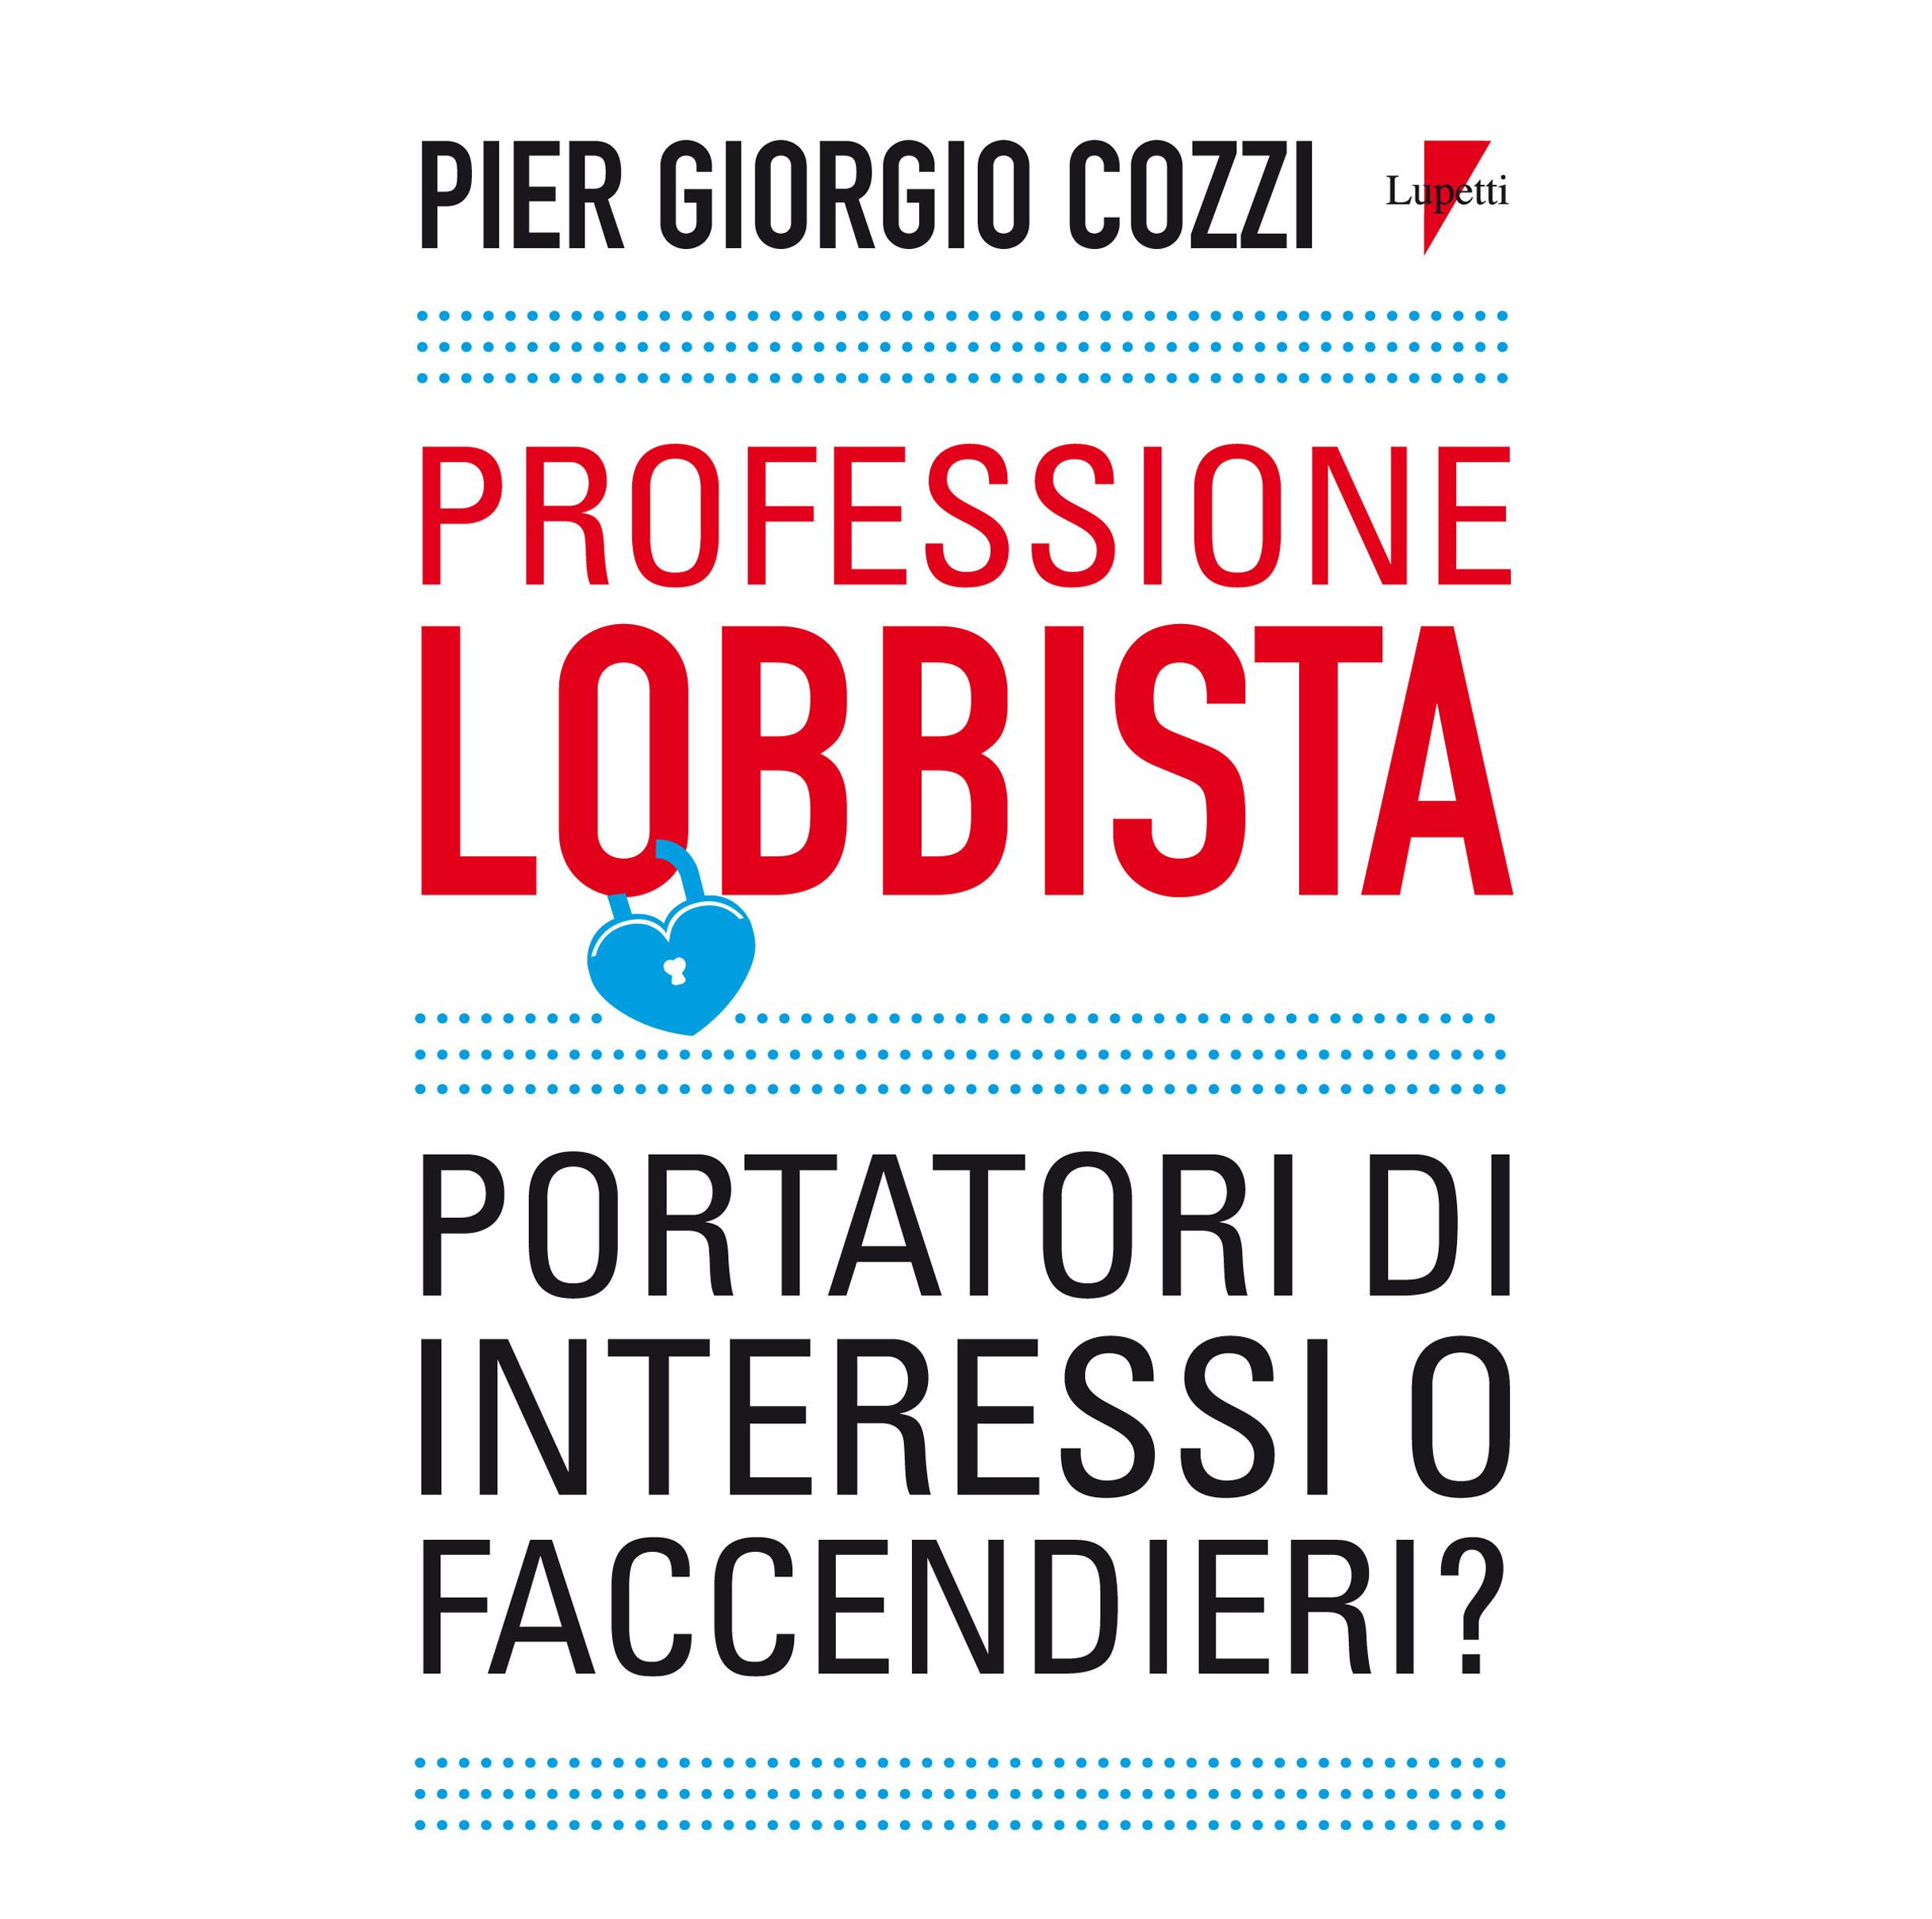 https://www.promotionmagazine.it/wp/wp-content/uploads/2014/01/cozzi_lobby_cover2.jpg